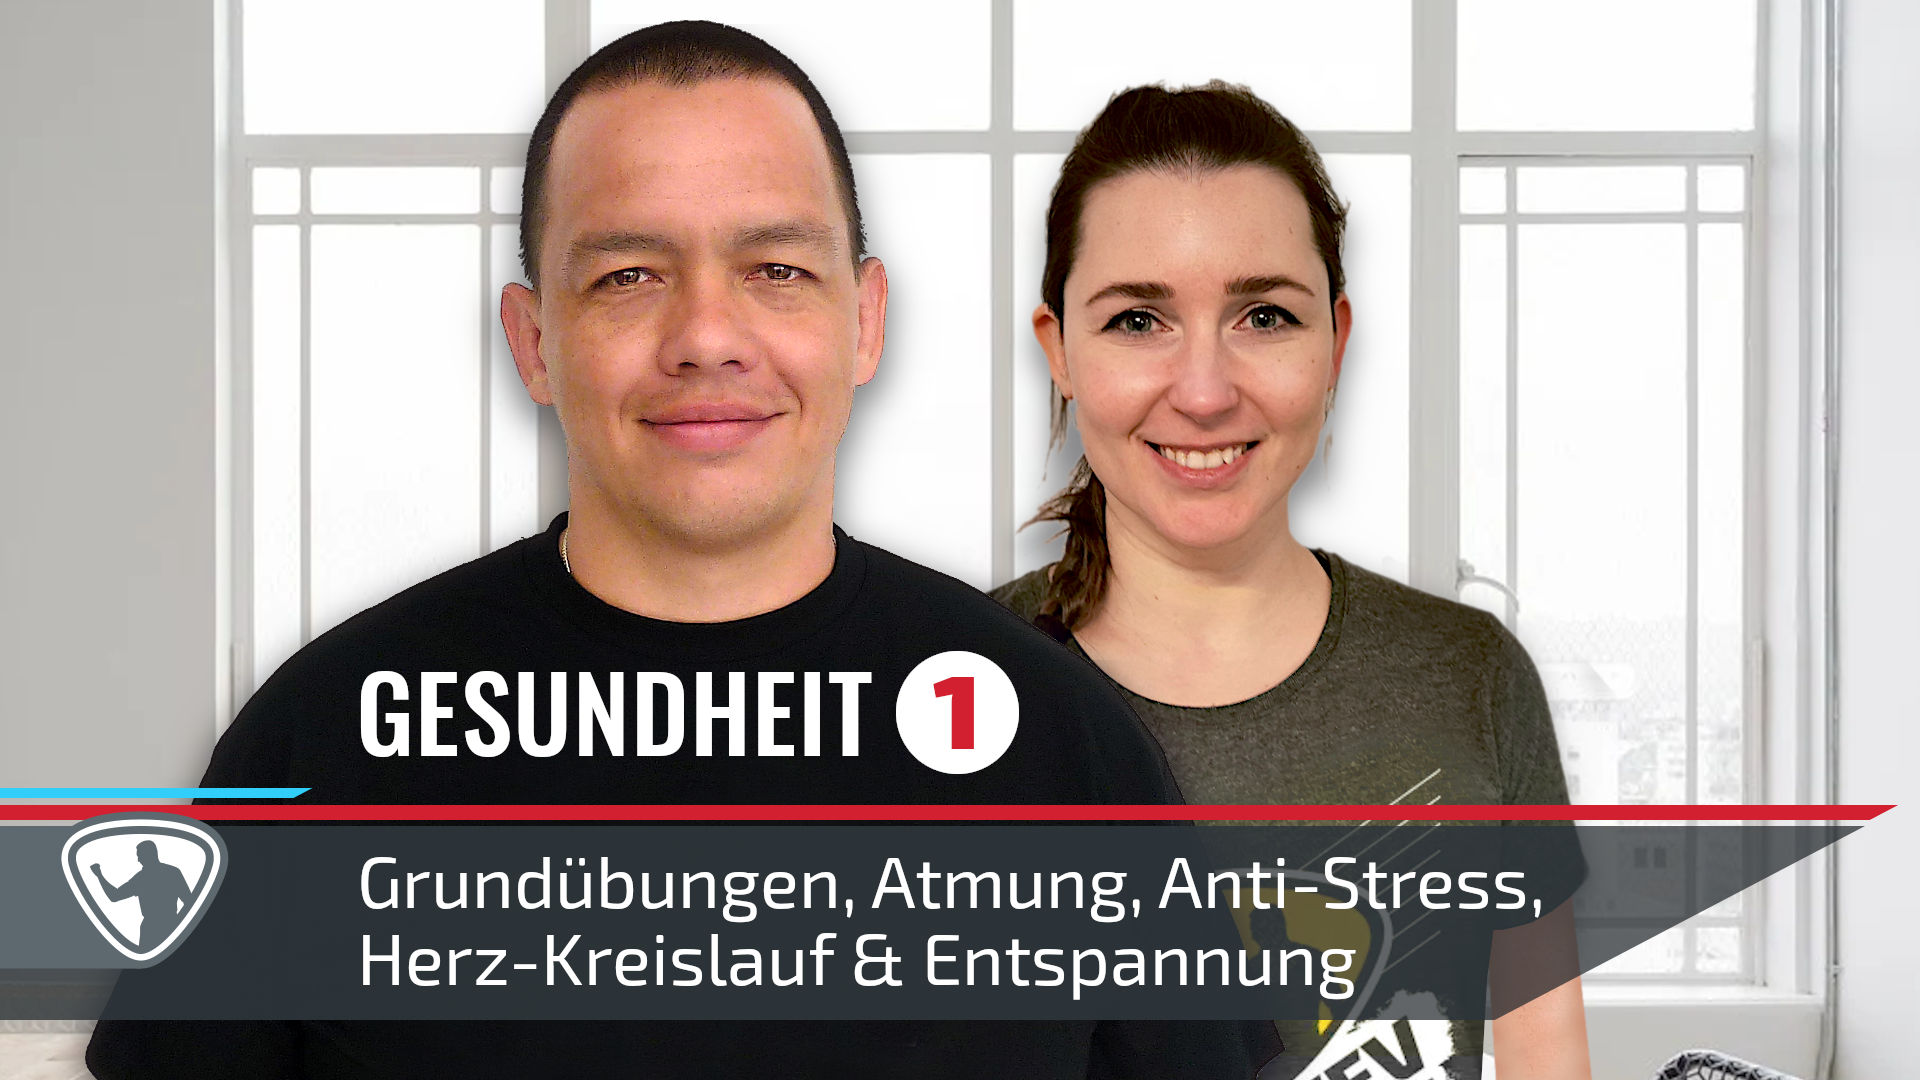 Gesundheit 1- Basiswissen